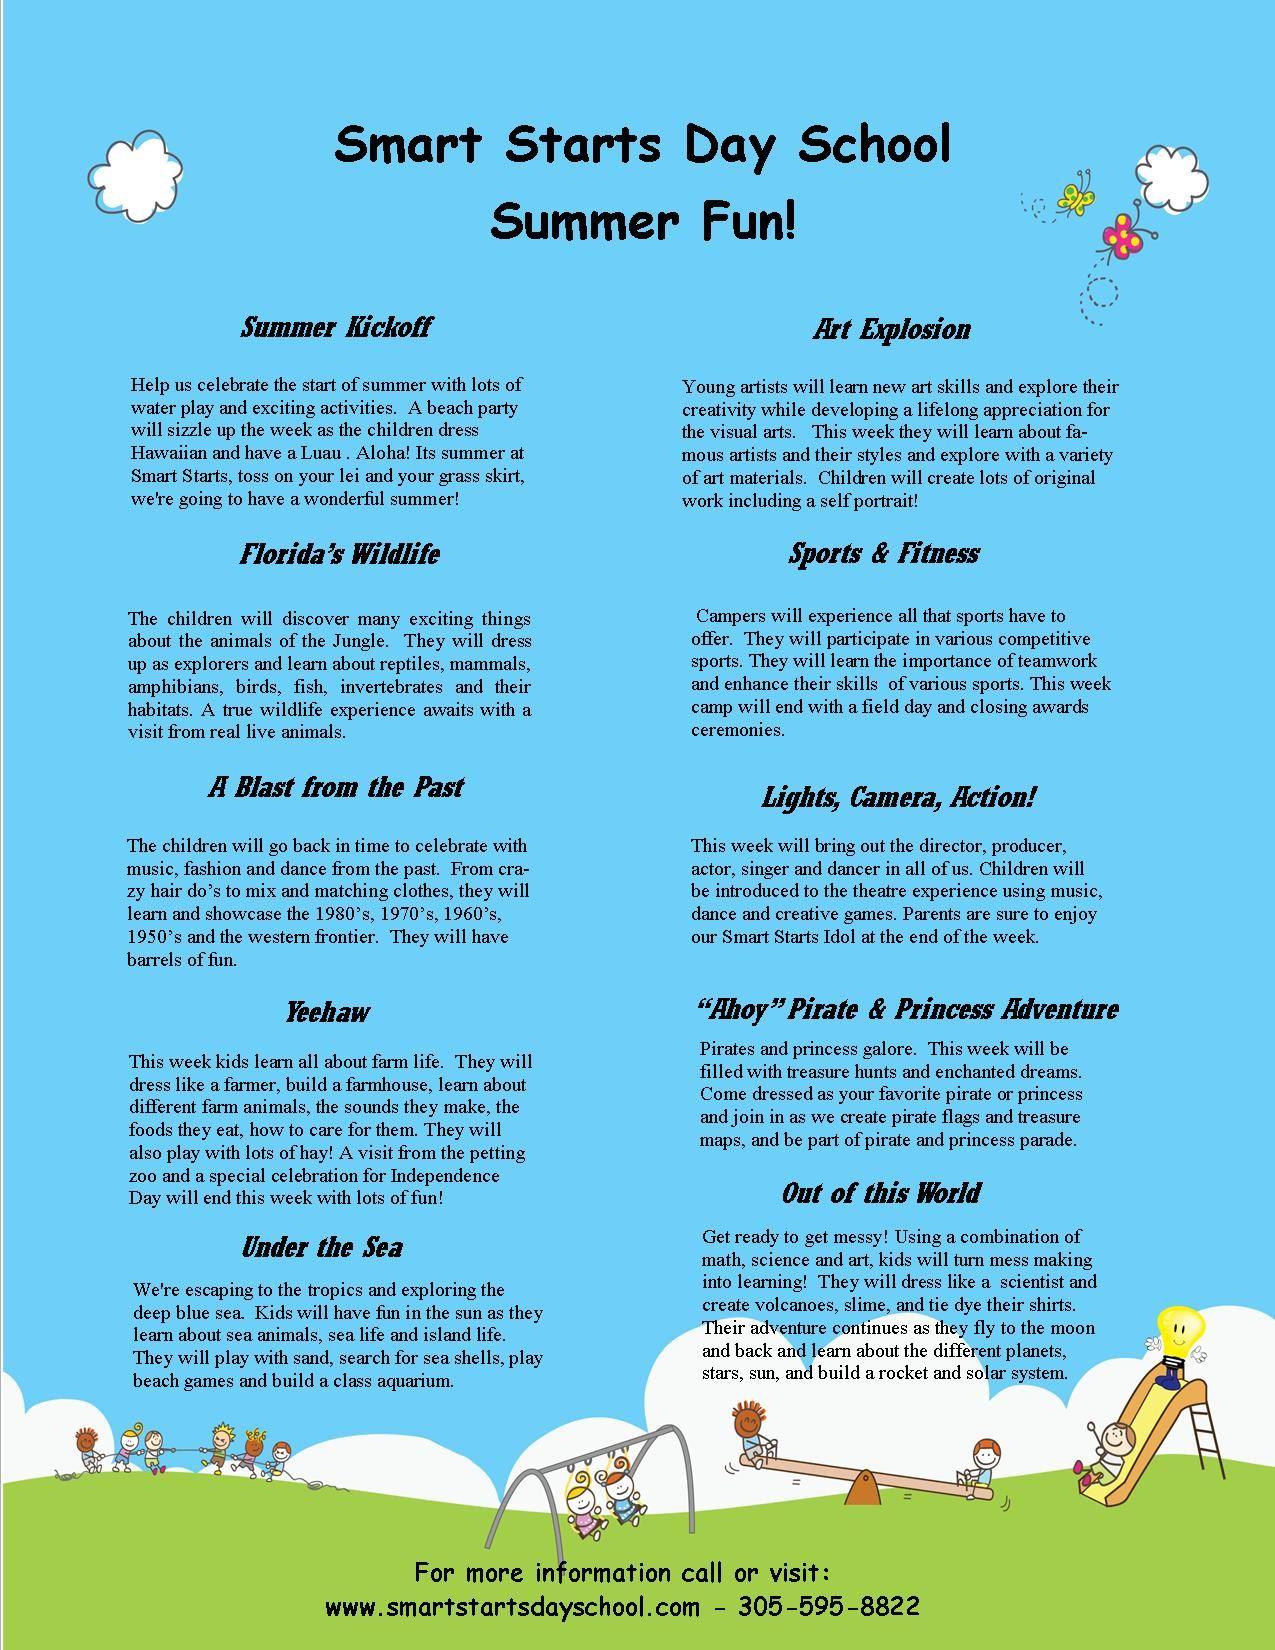 Smart Starts Day School Preschool Summer Camp With Images